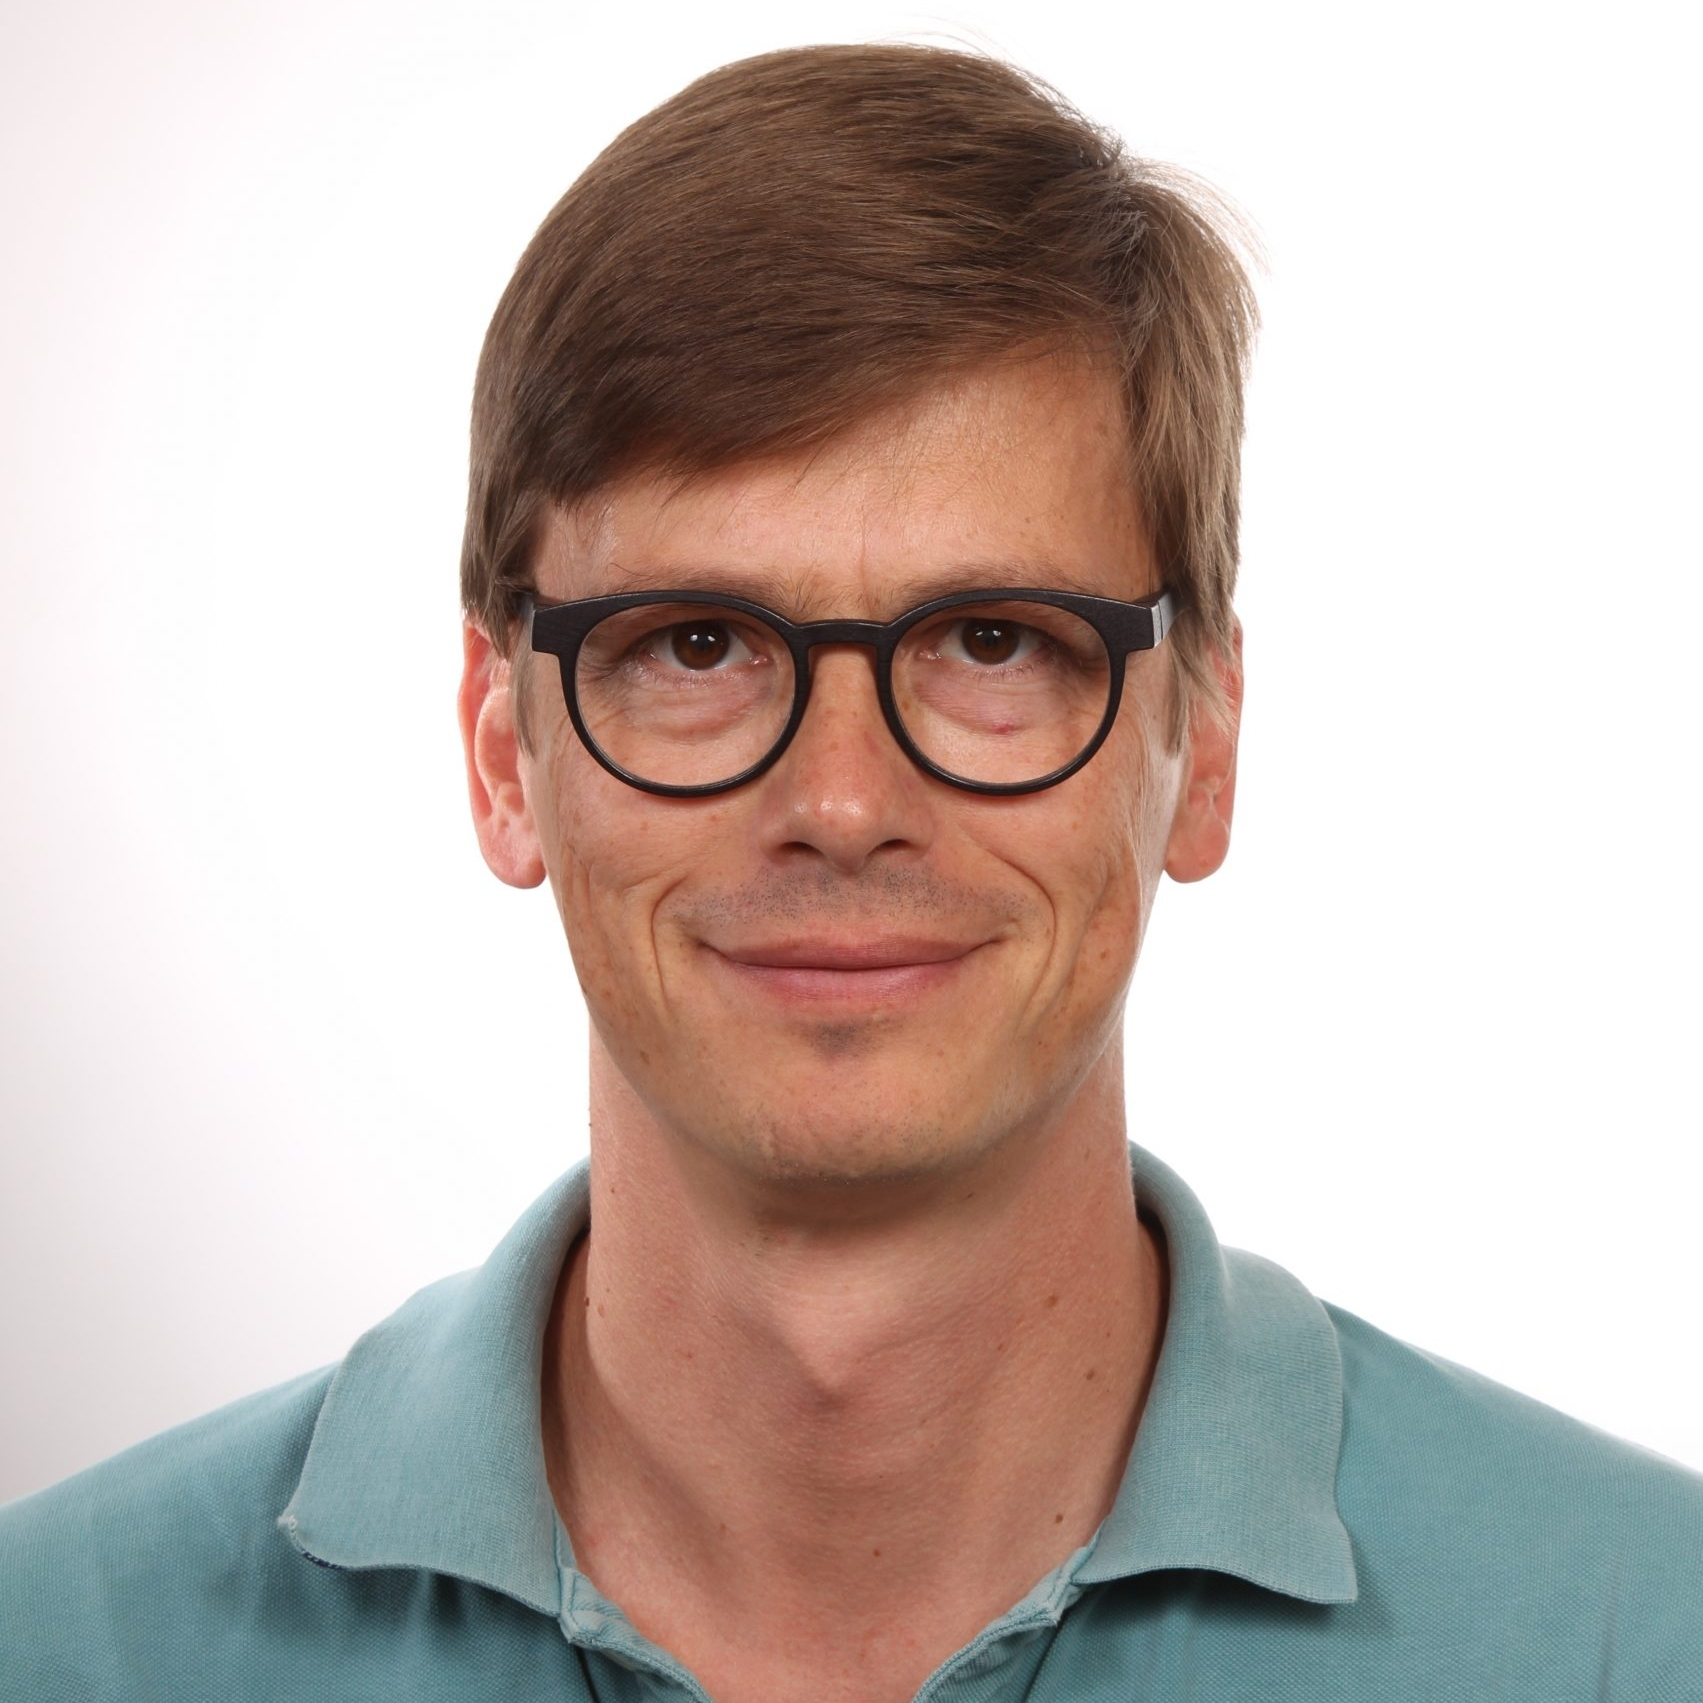 Kooperationspartner Dietz Training und Partner Christian Ried